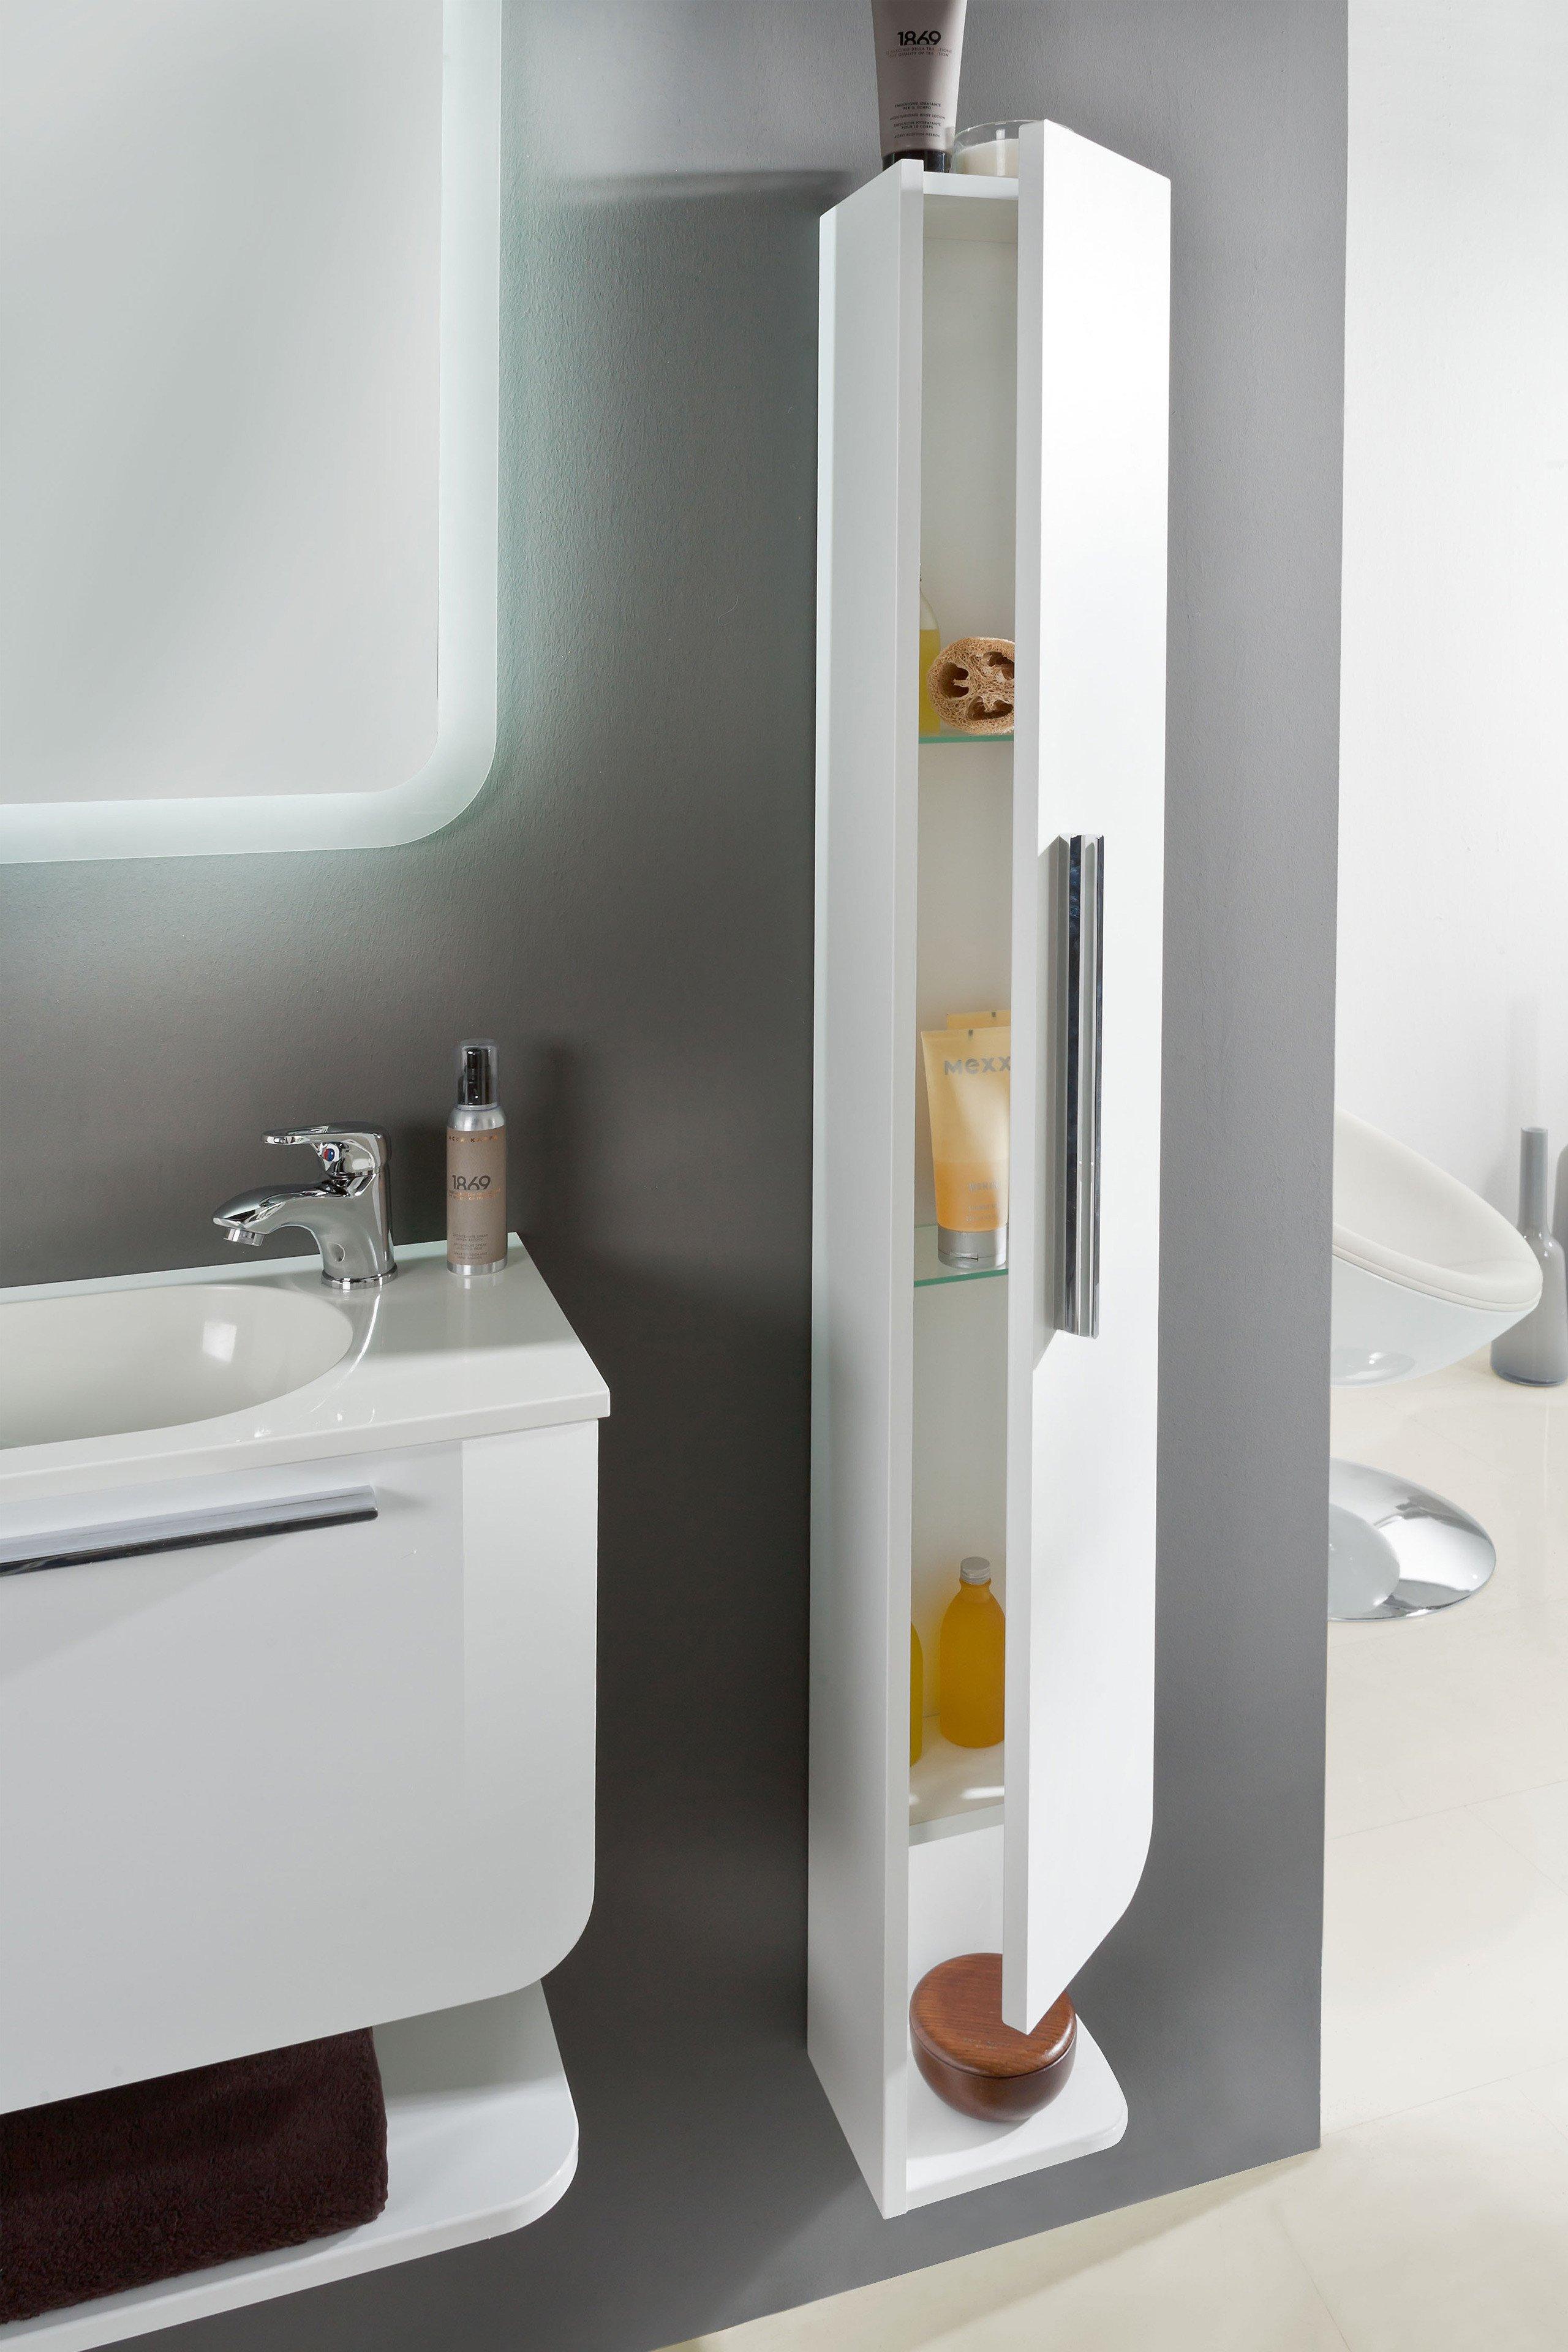 marlin badm bel 3010 1 wei glanz m bel letz ihr online shop. Black Bedroom Furniture Sets. Home Design Ideas